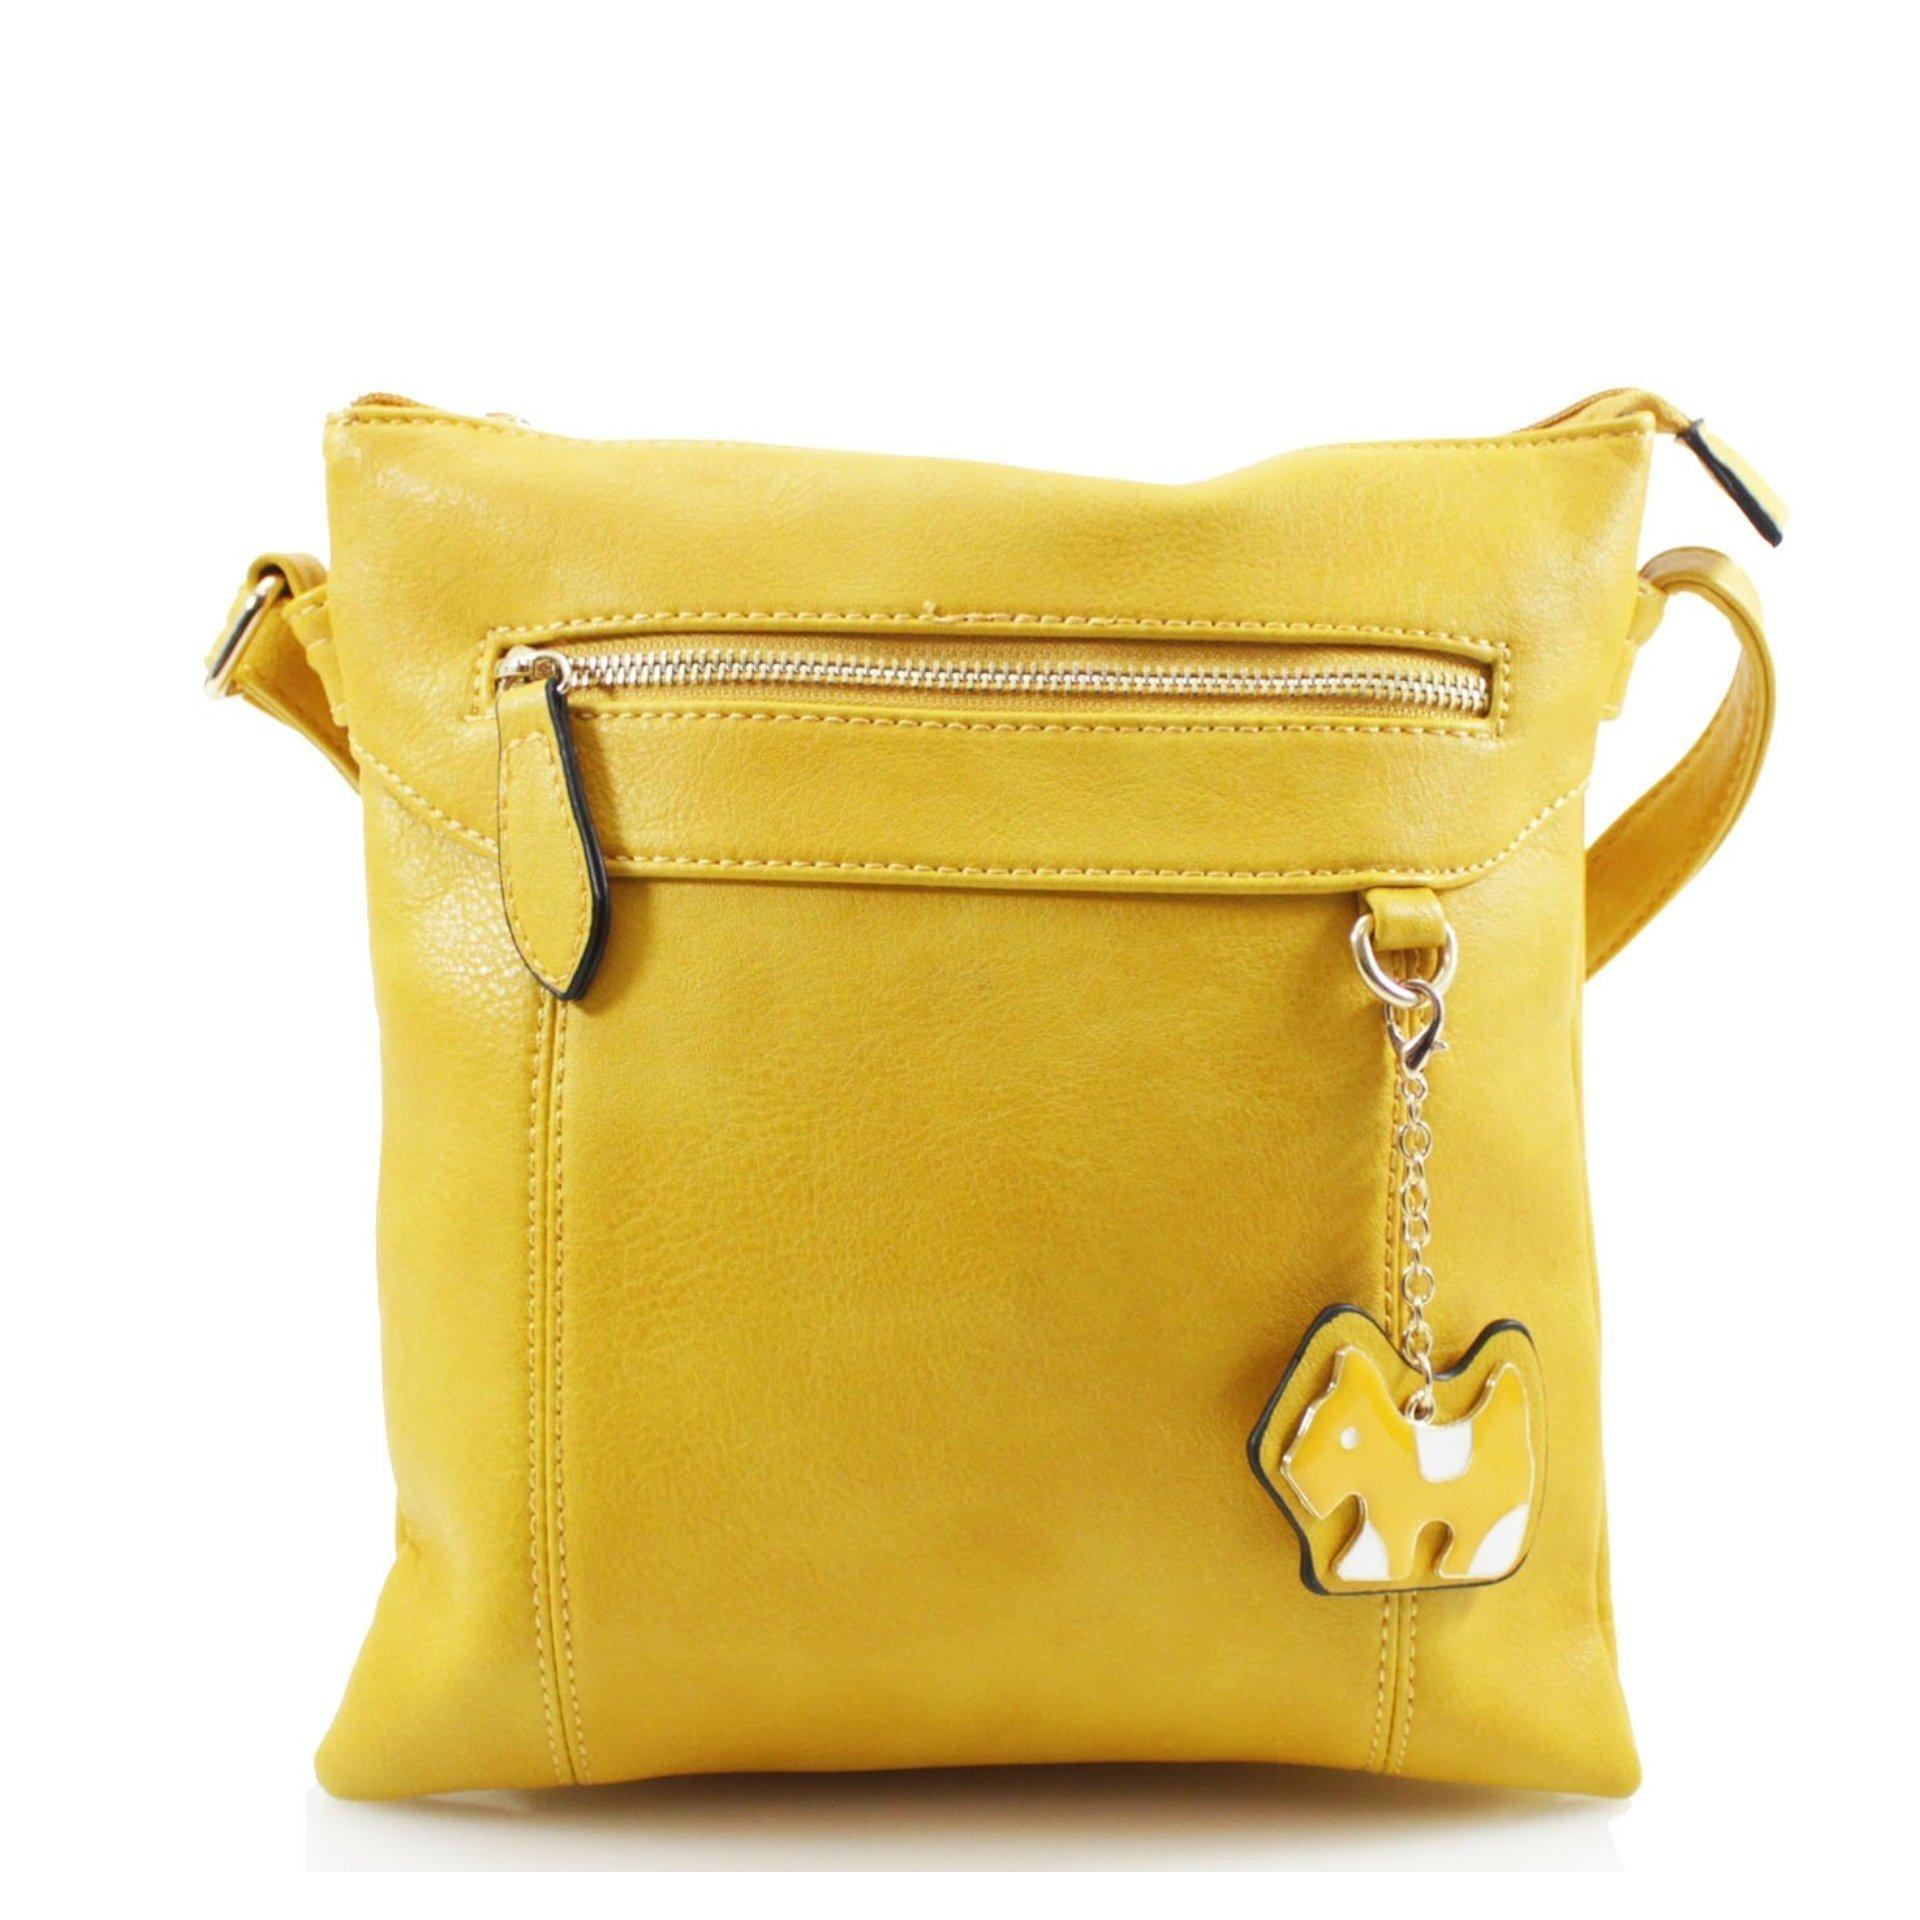 yc059-1-yellow.jpg